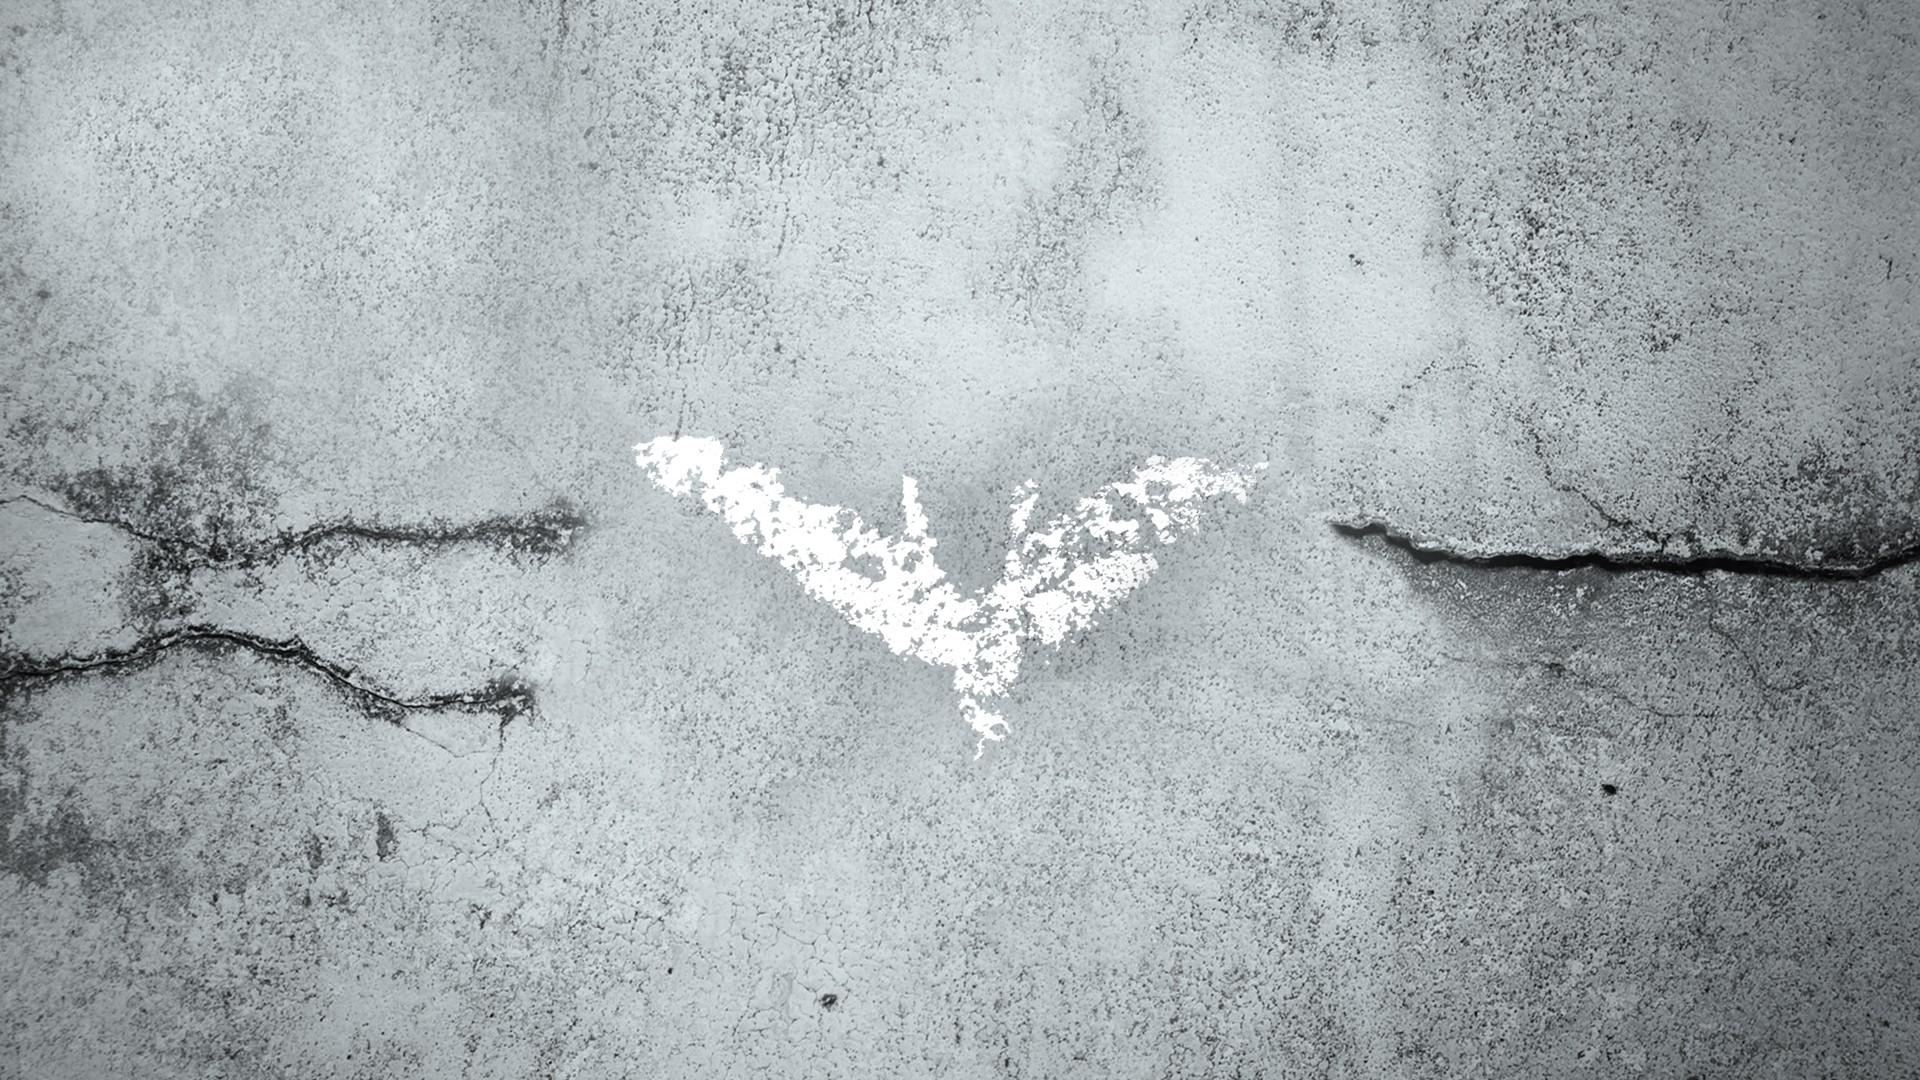 The Dark Knight Rises Hd Wallpaper Background Image 1920x1080